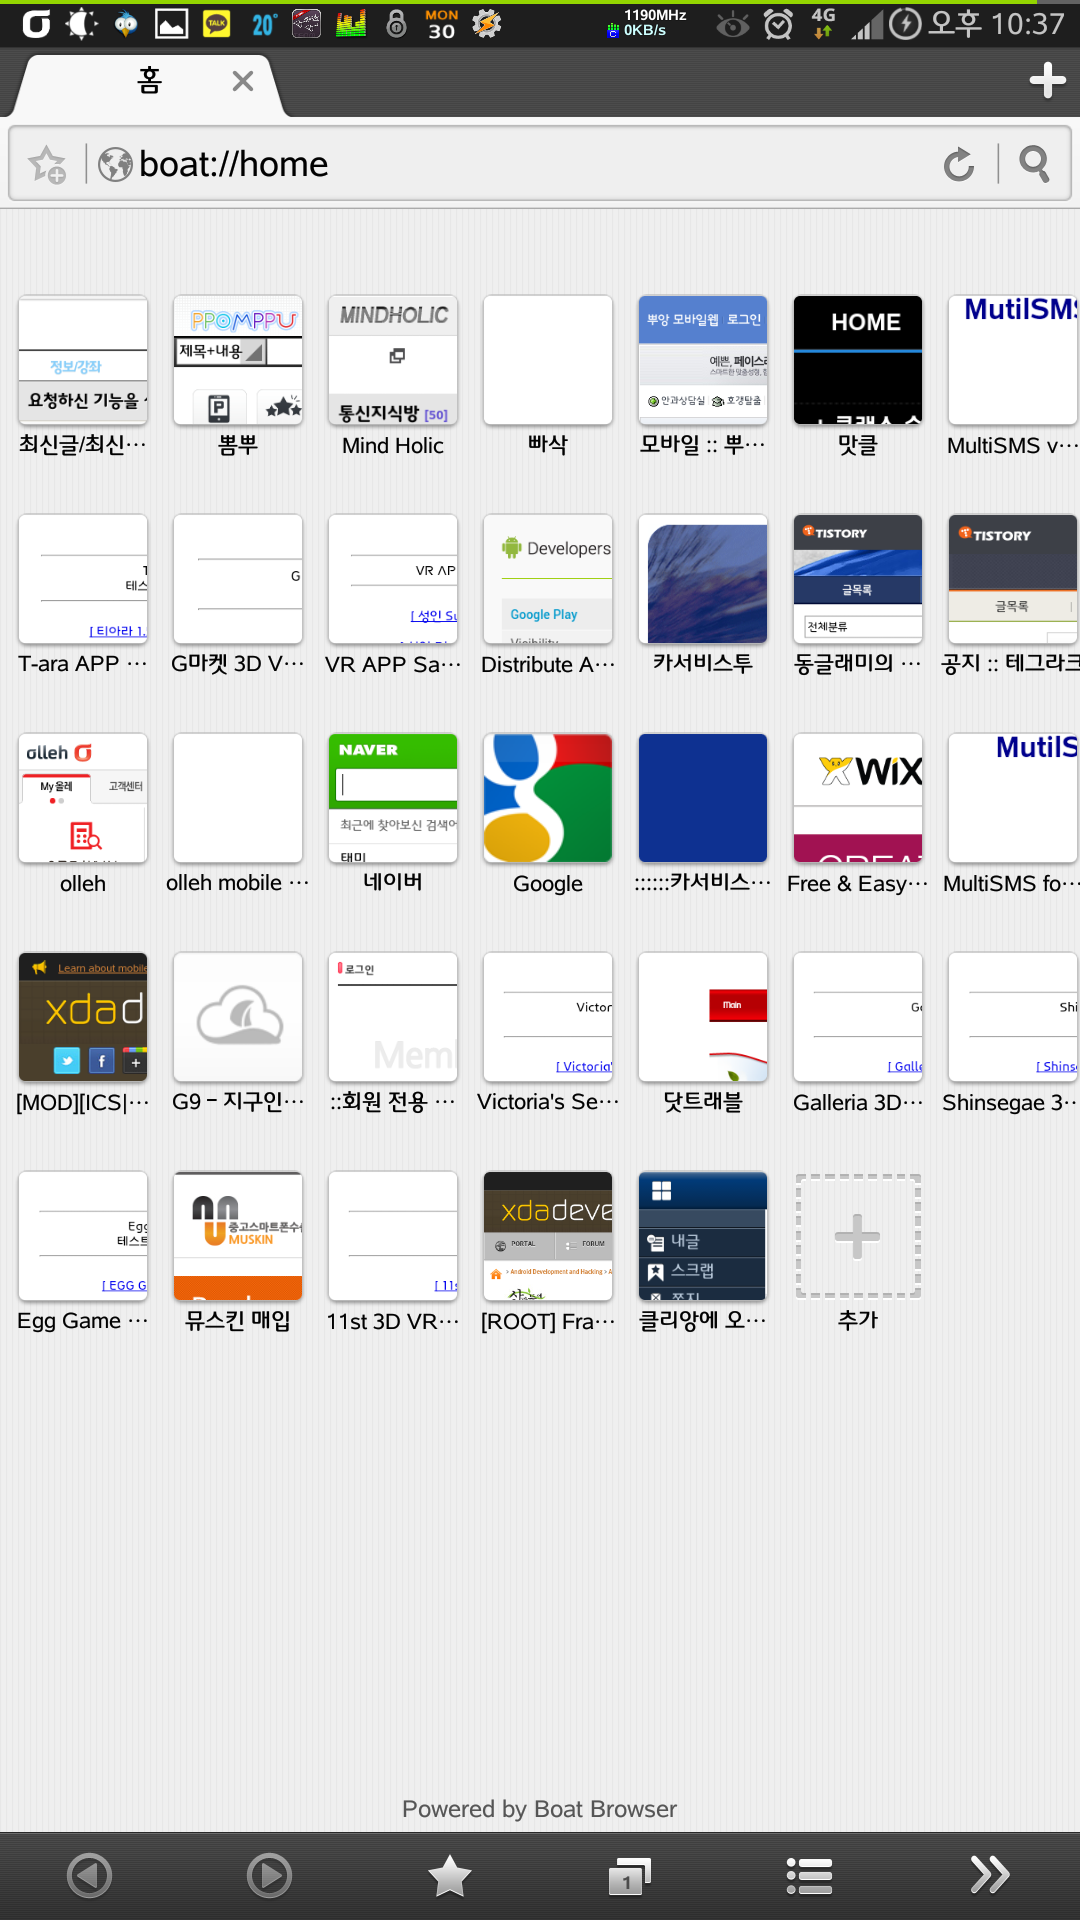 Screenshot_2013-09-30-22-38-00.png